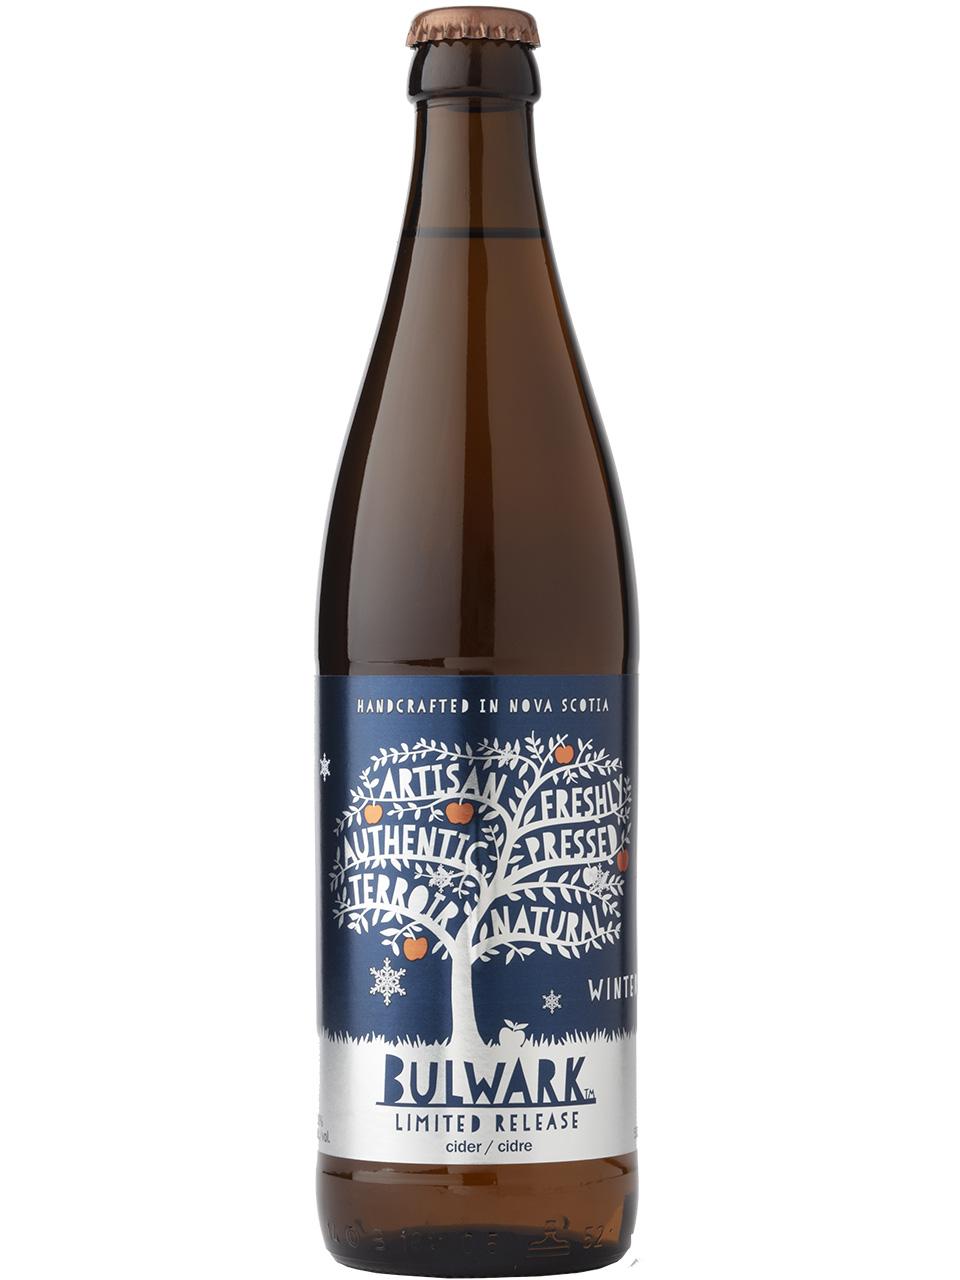 Bulwark Winter Cider 500ml Bottle